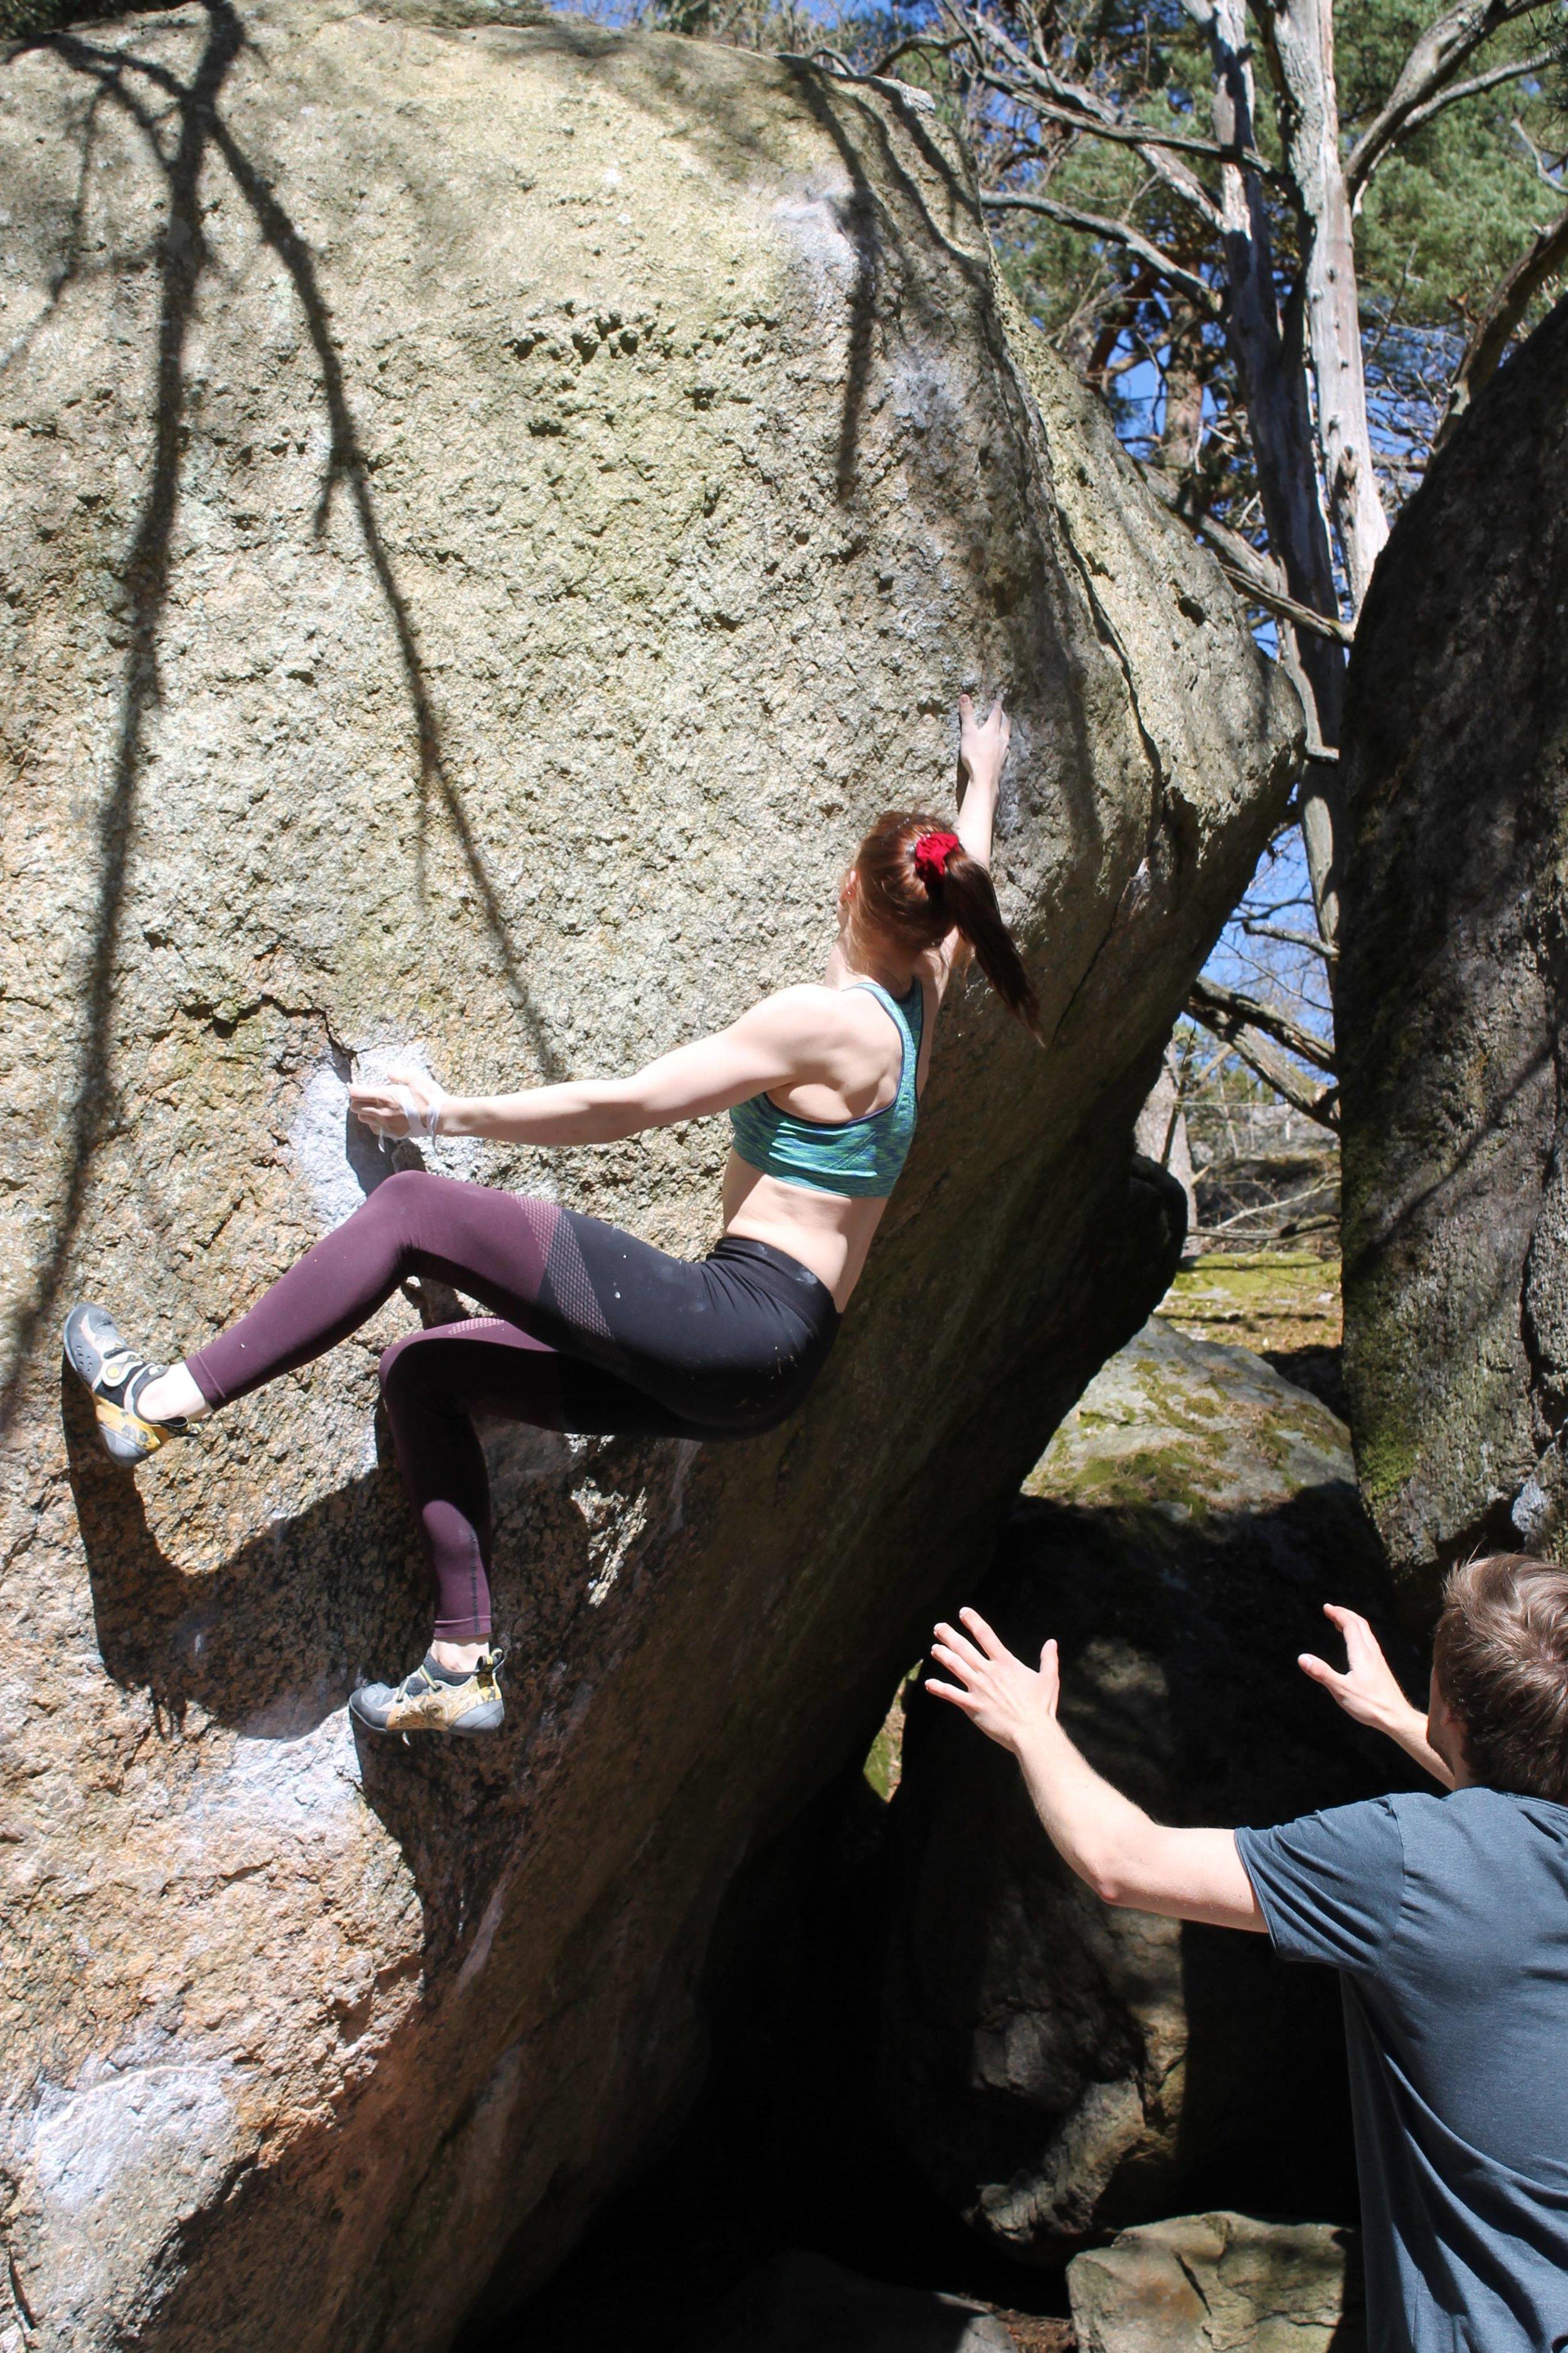 freja ruterbygger odense boulders klatring.jpg